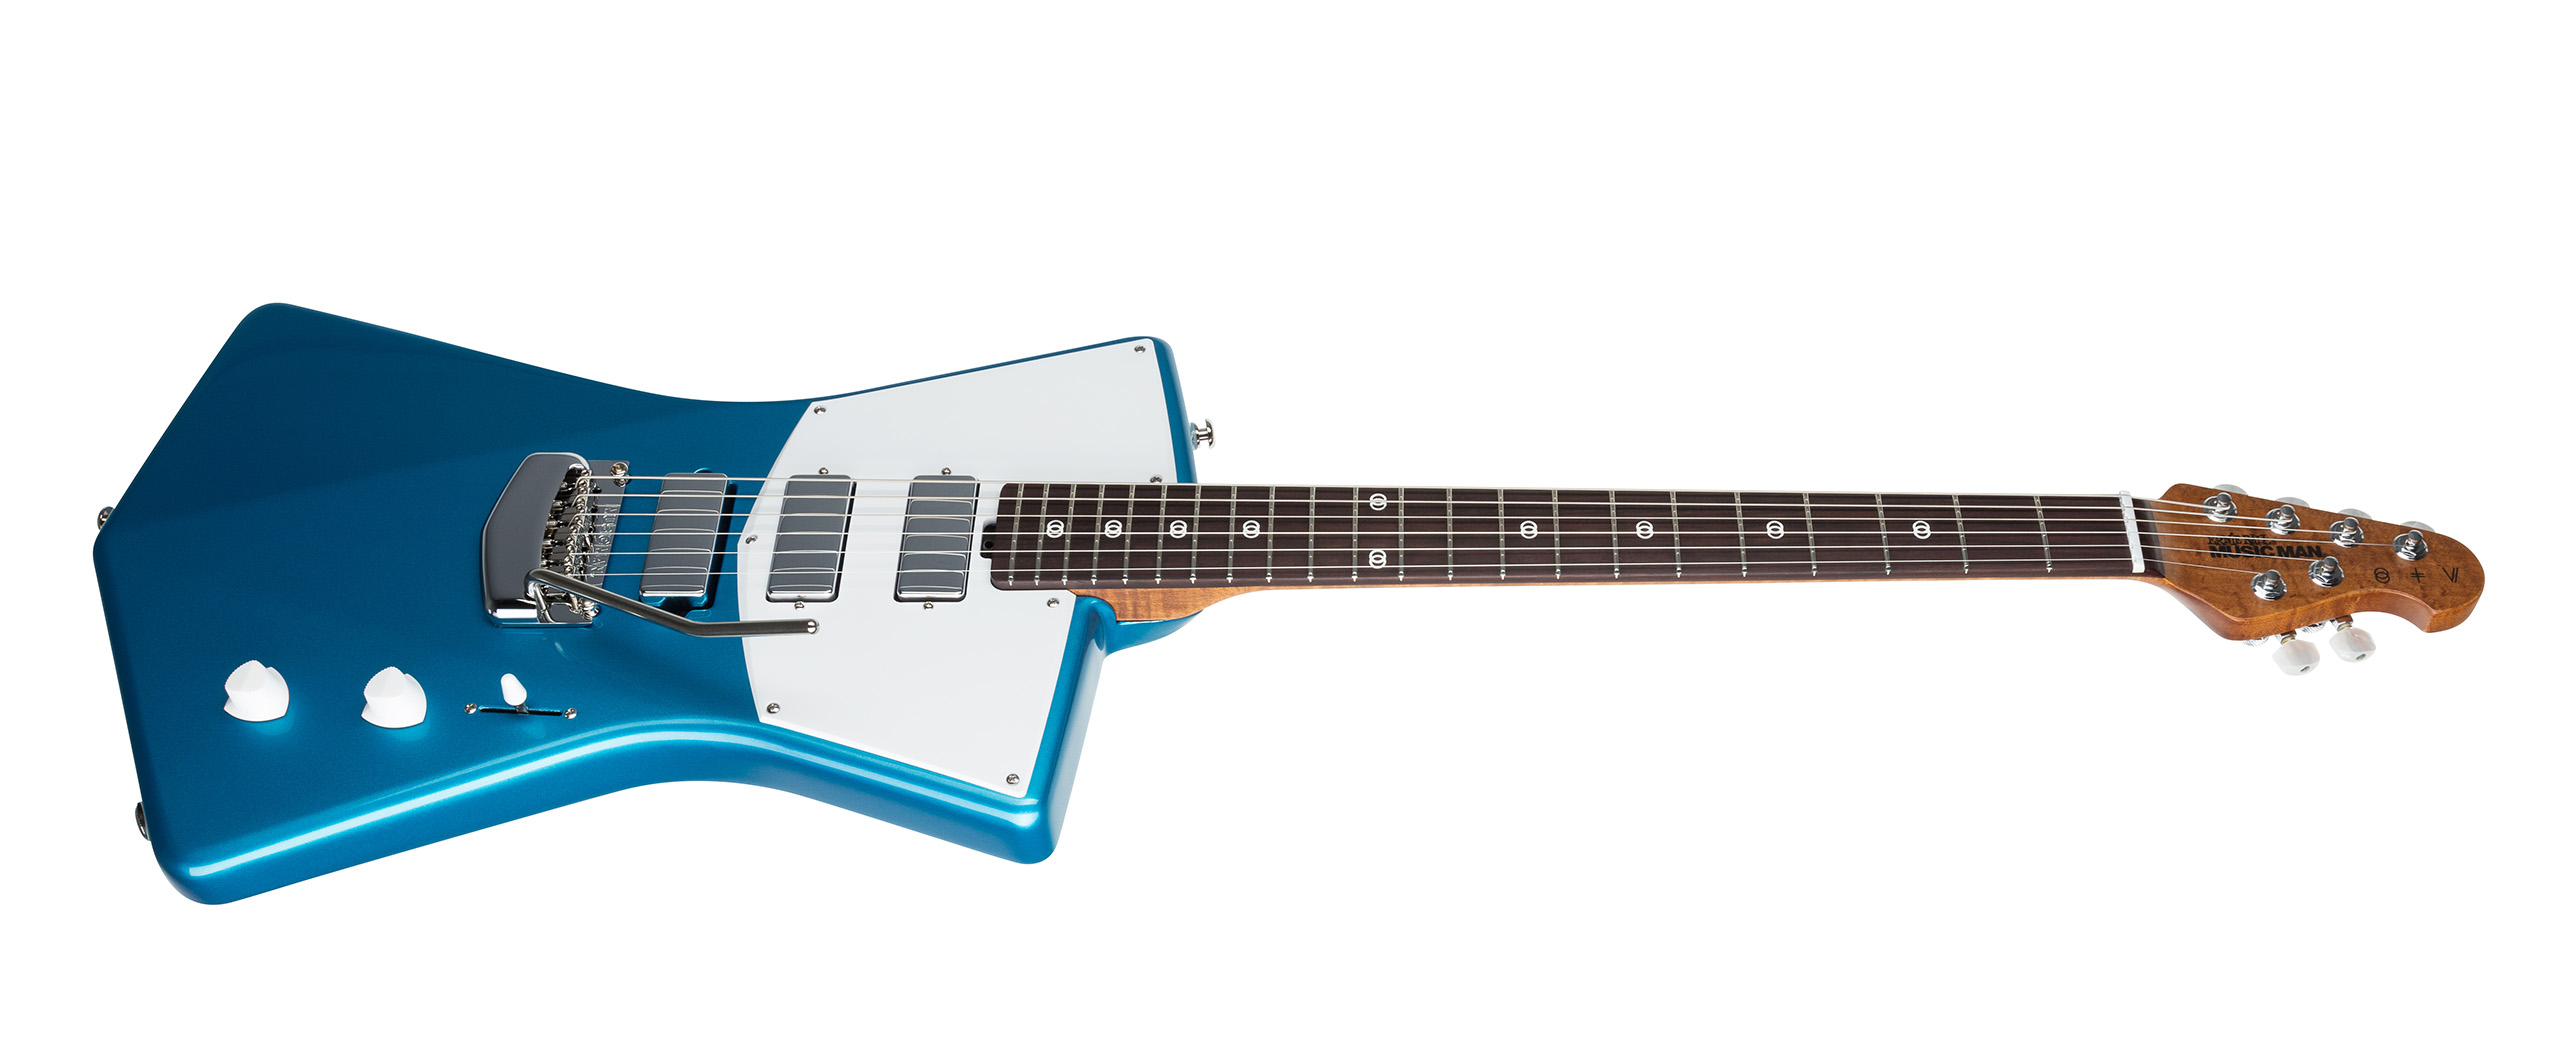 St Vincent 2018 Guitars Ernie Ball Music Man 3 Humbucker 5 Switch Tremola Wiring Diagrams Slide